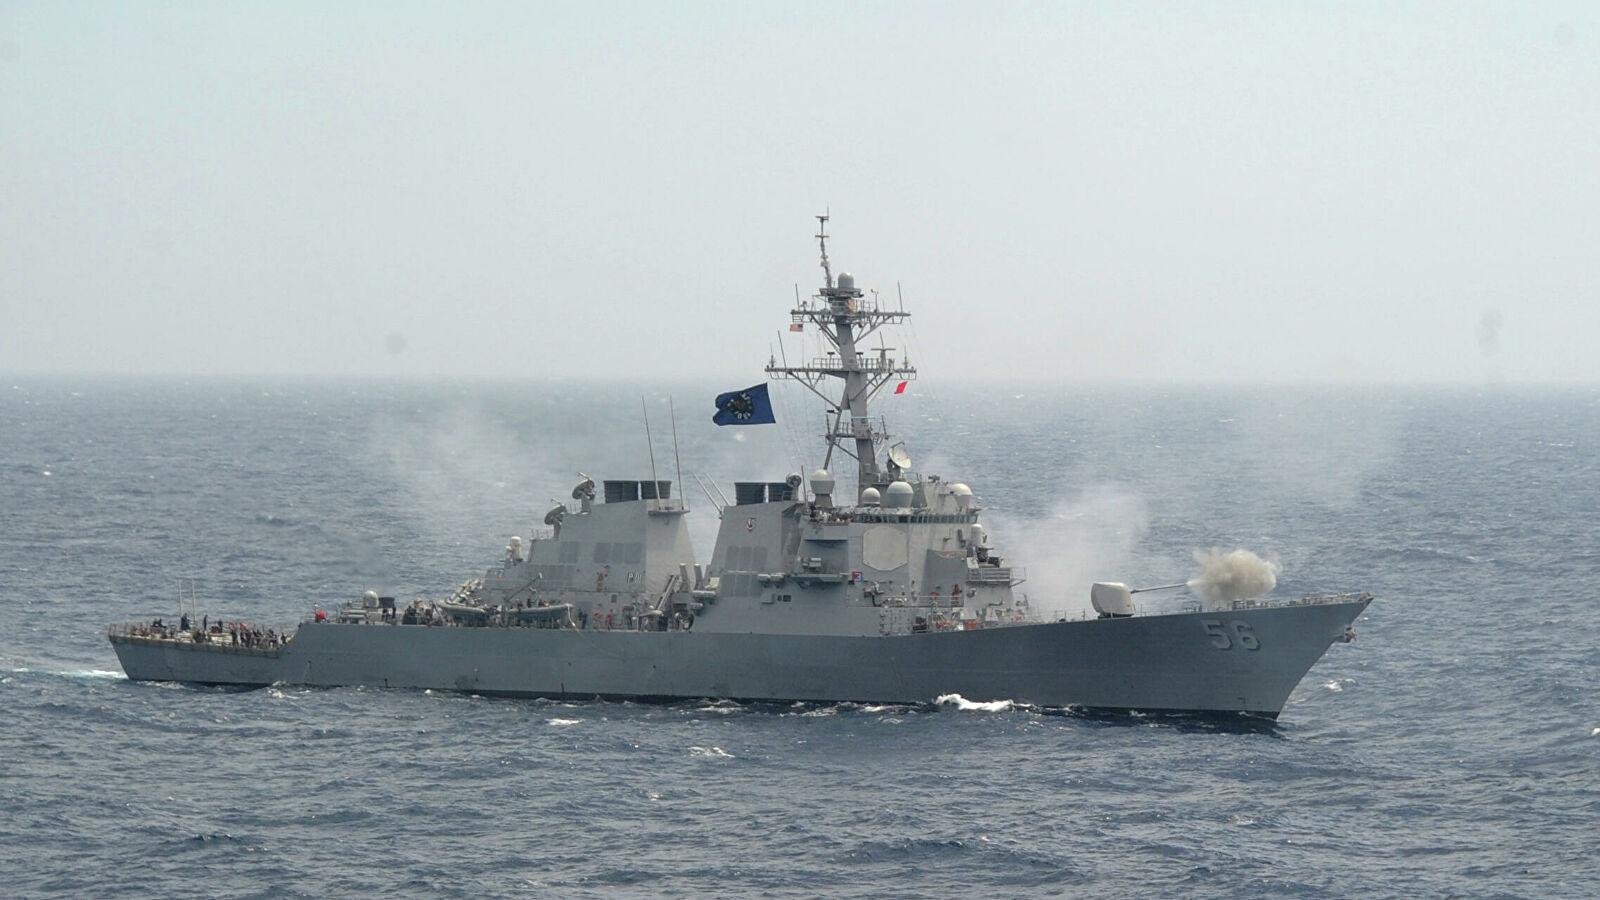 apple developer:俄罗斯指责美军舰侵入海域两公里:已出动反潜舰驱逐 第1张